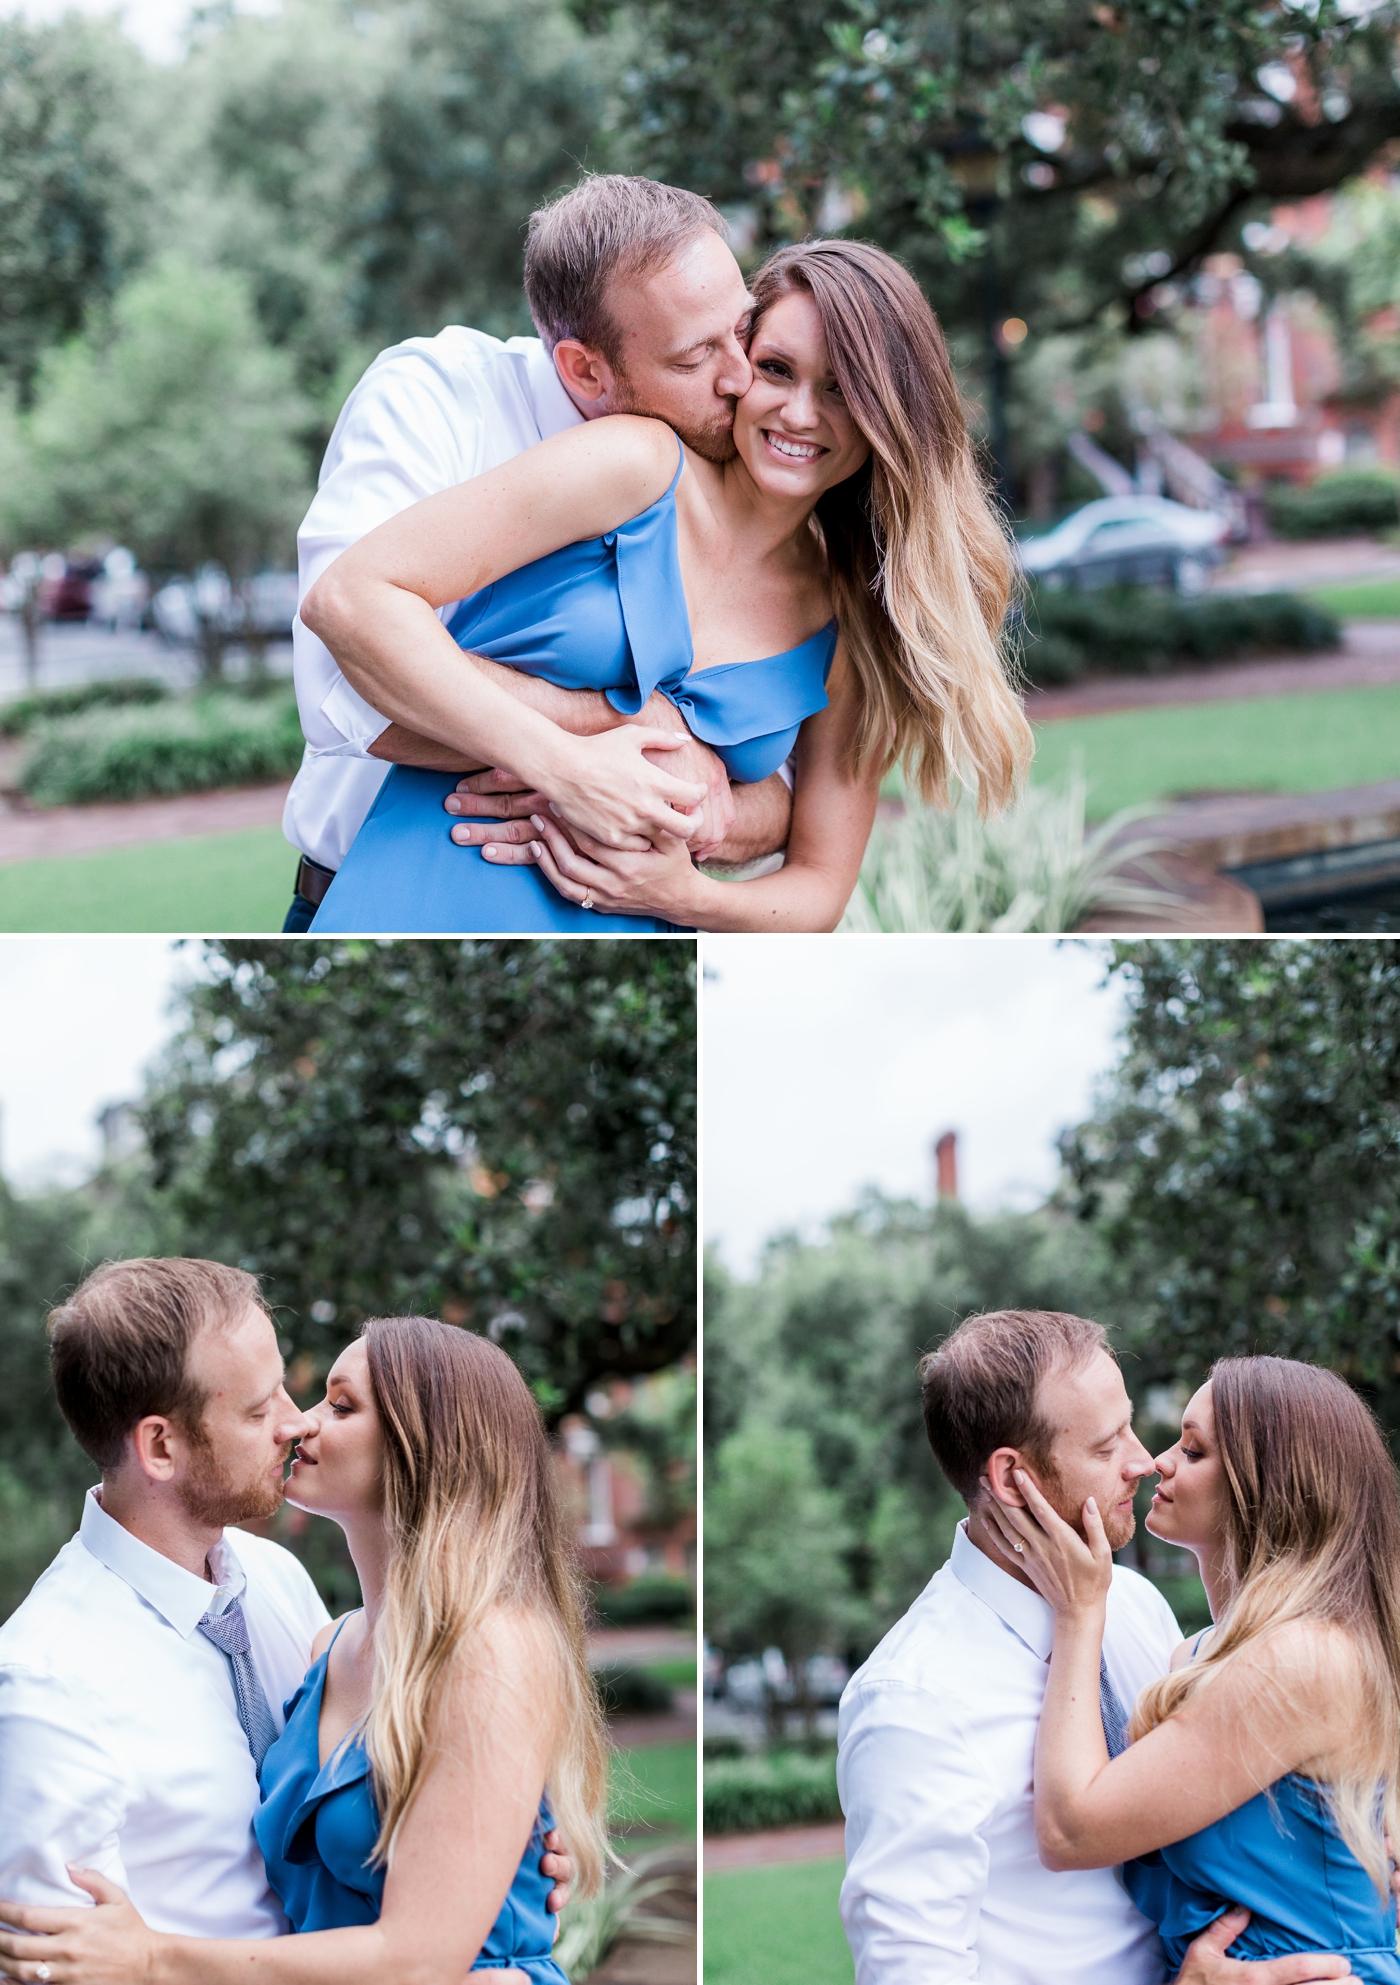 Lauren and Jacob's surprise proposal in Savannah, Georgia